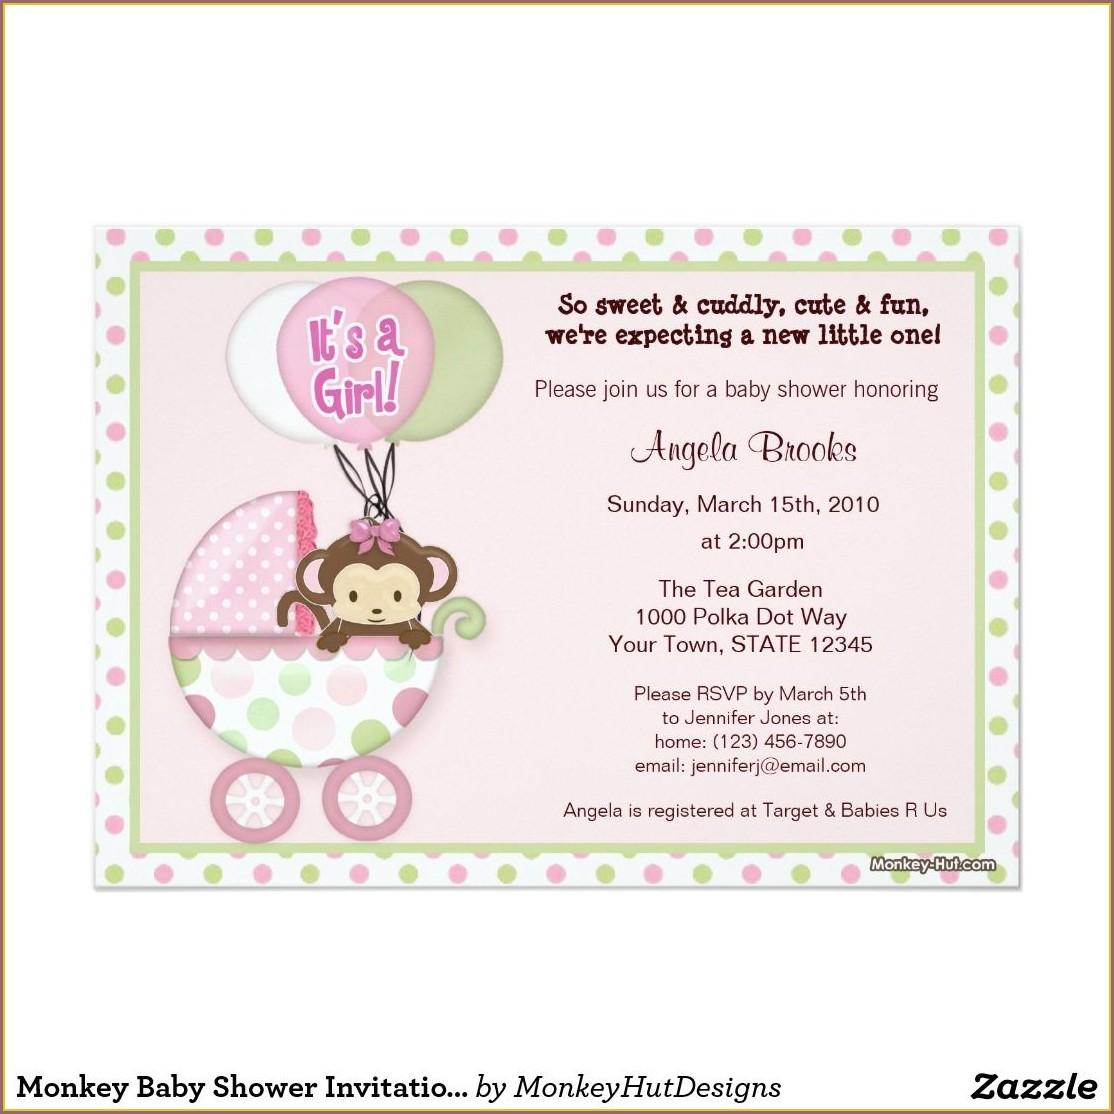 Monkey Hut Designs Invitations